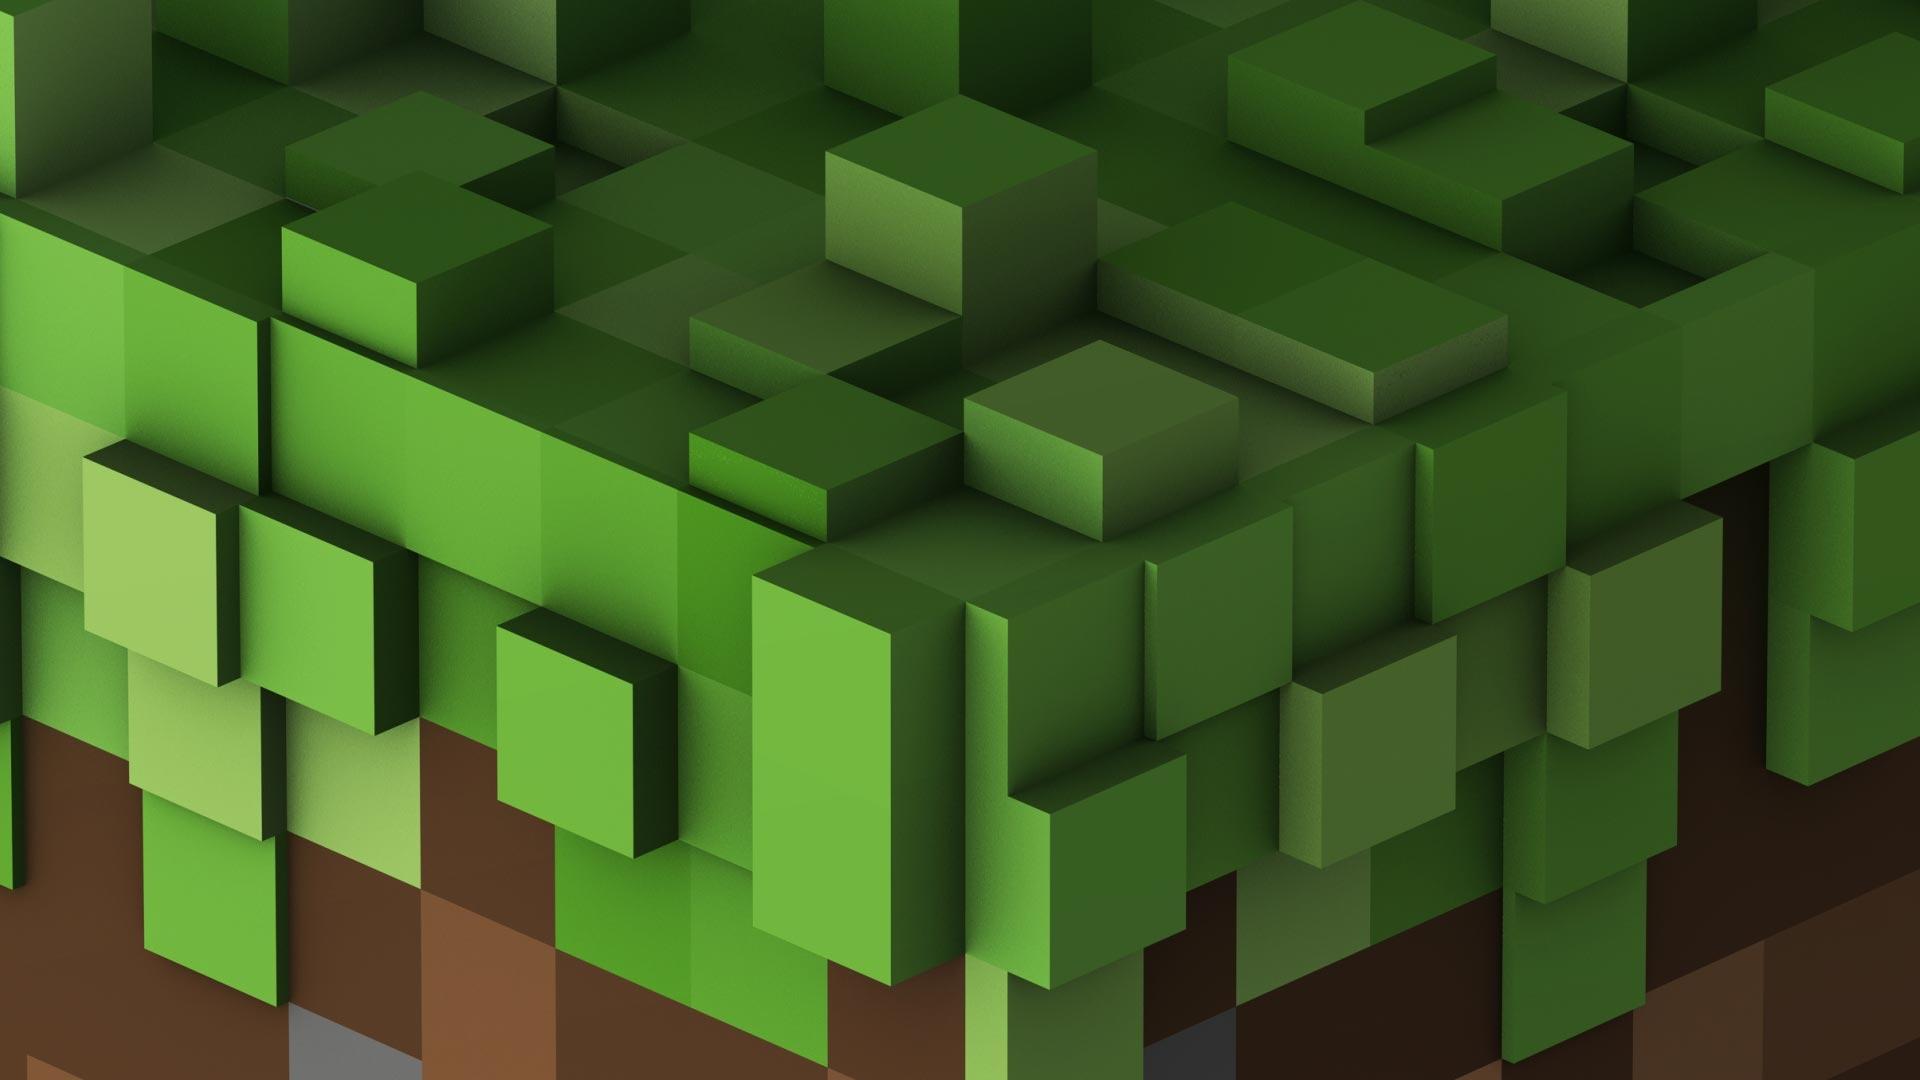 Minecraft Theme for Windows 10 | 8 | 7